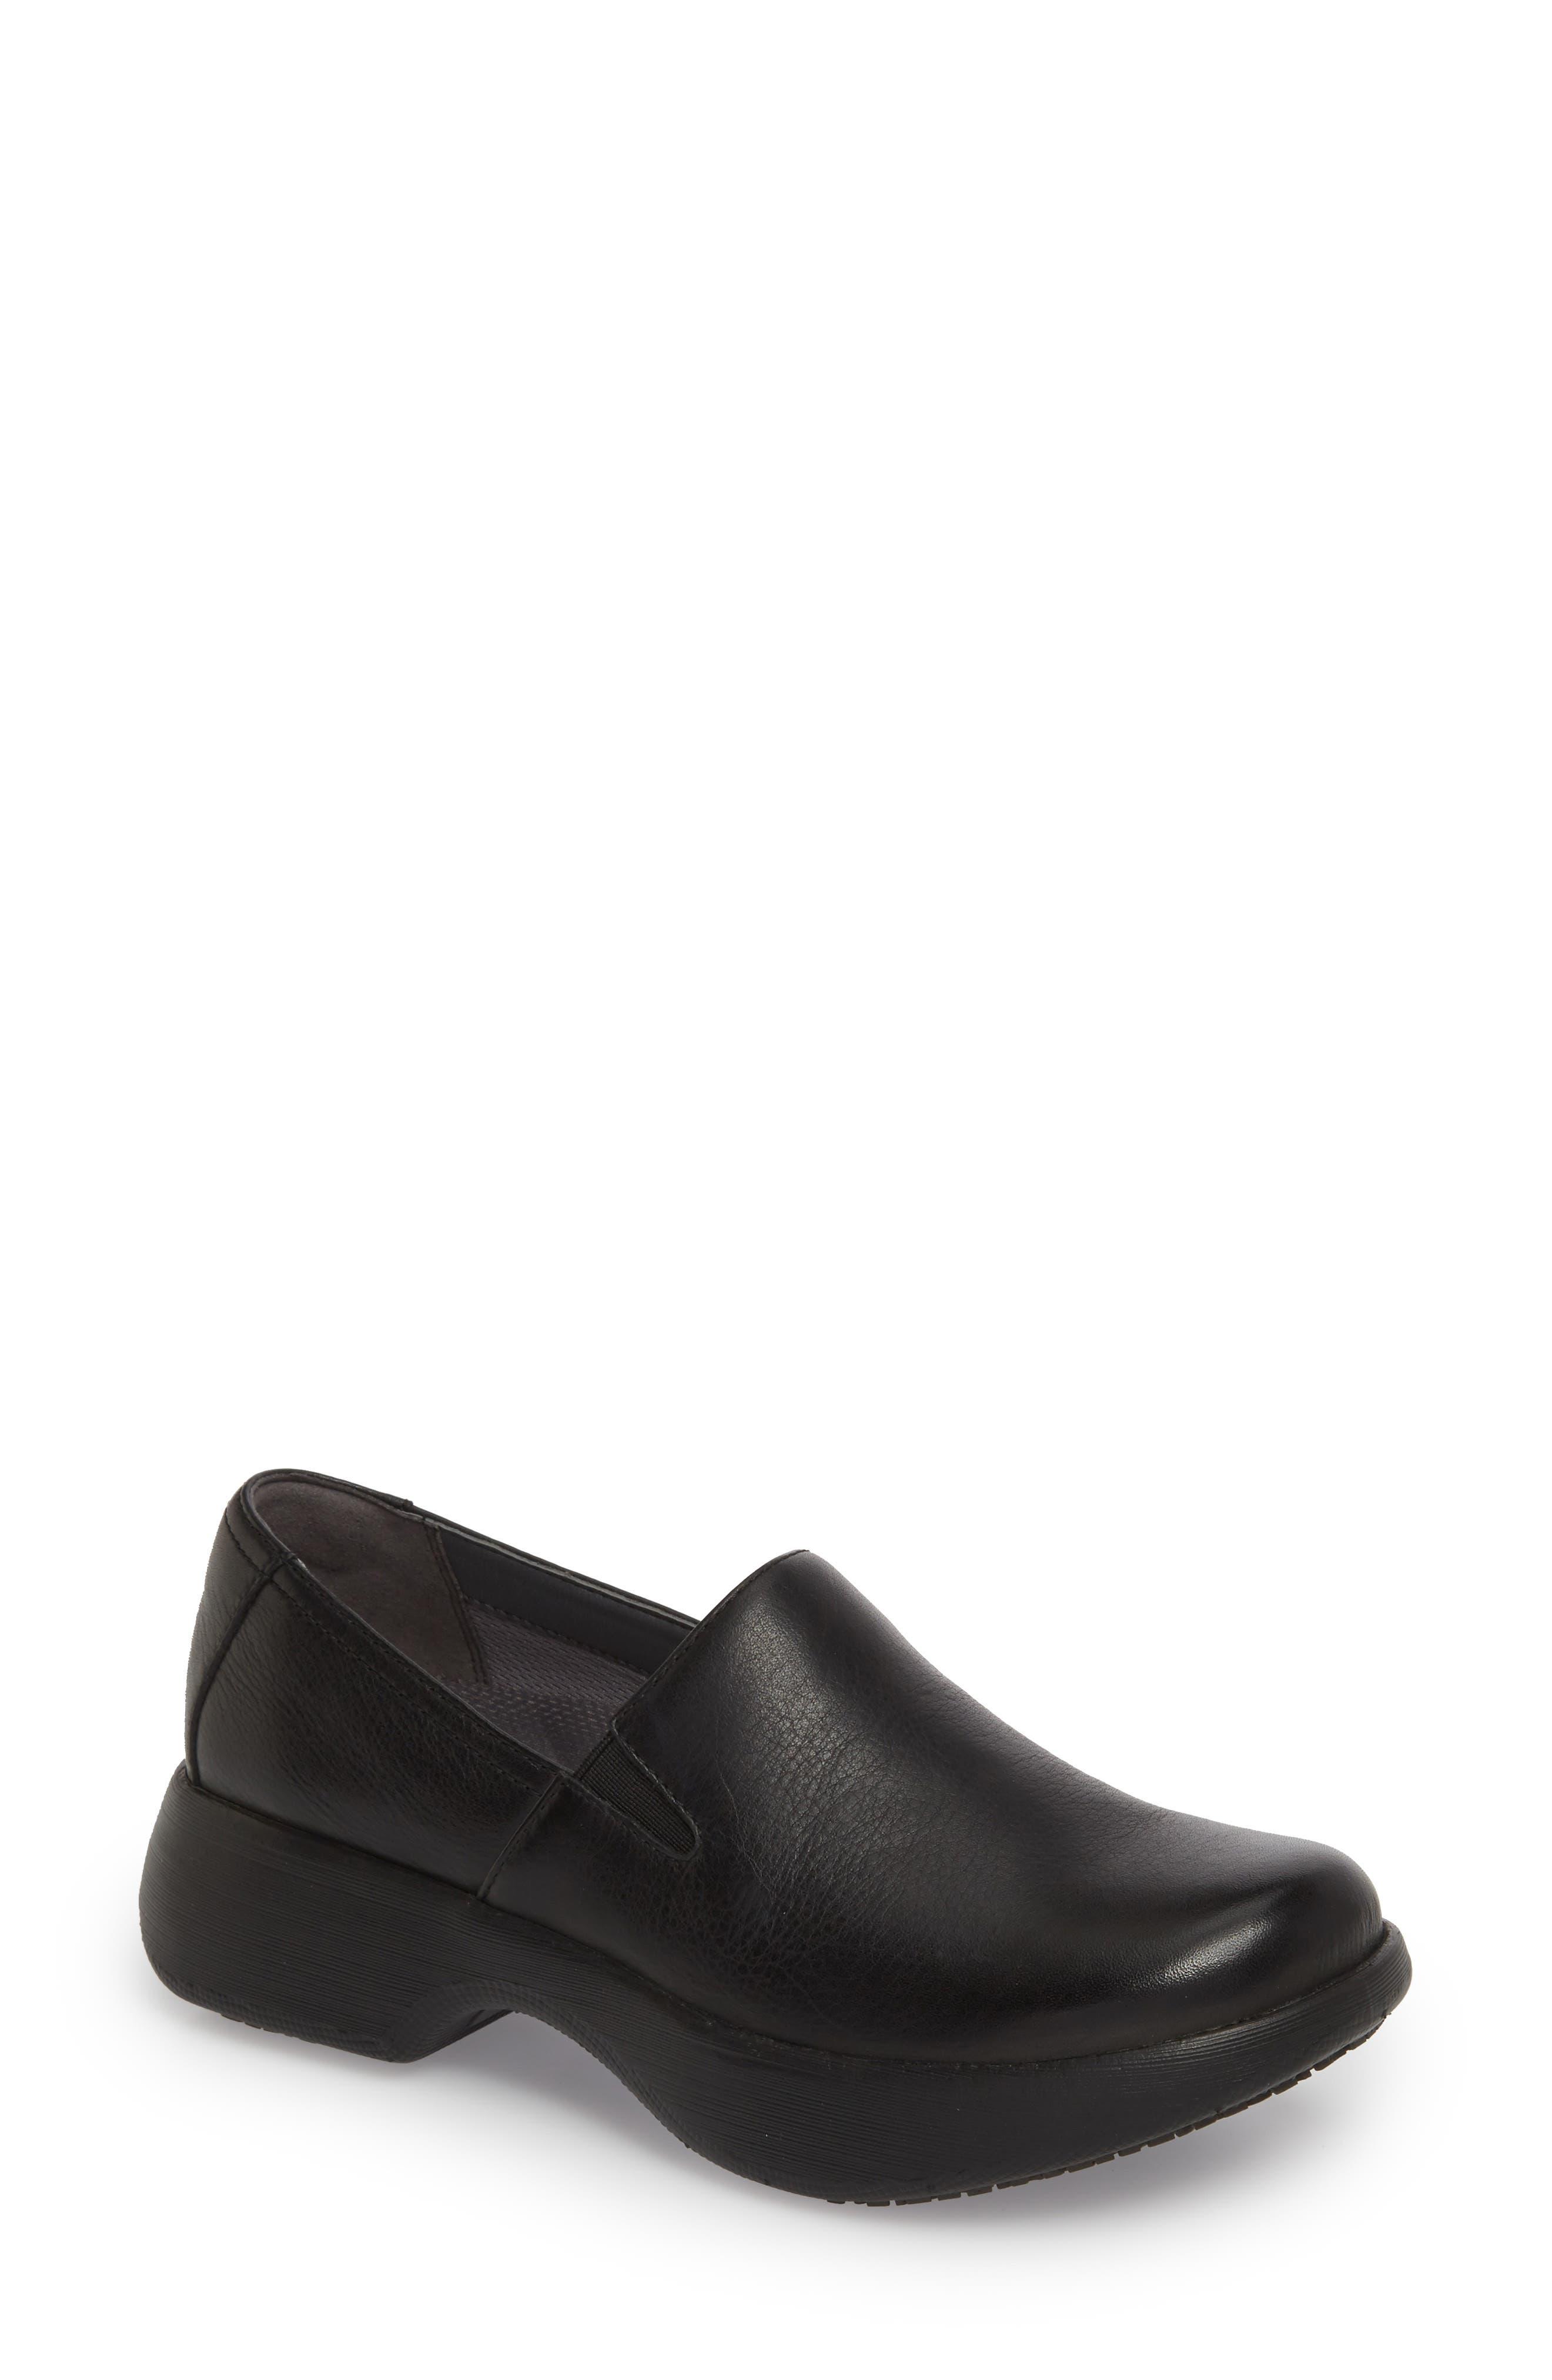 Winona Slip-On Clog,                         Main,                         color, BLACK MILLED LEATHER